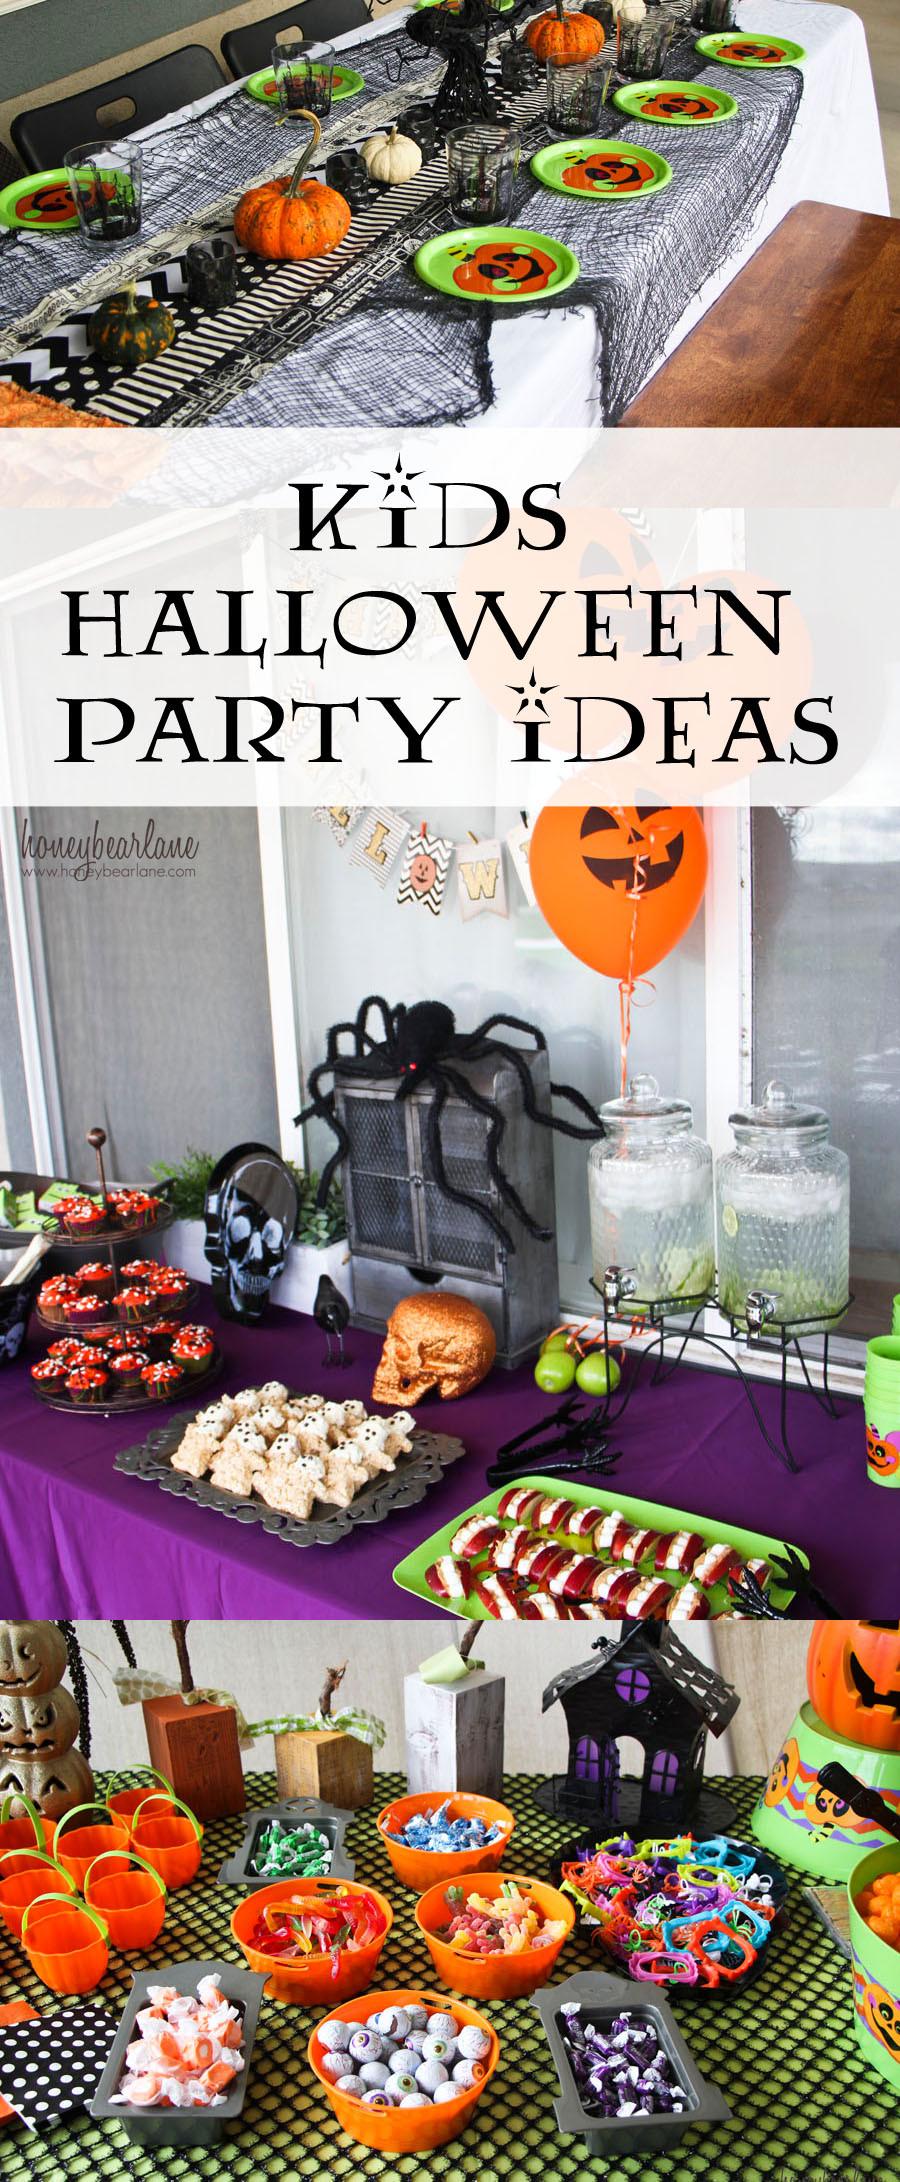 Family Halloween Party Ideas  Kids Halloween Party Ideas Honeybear Lane